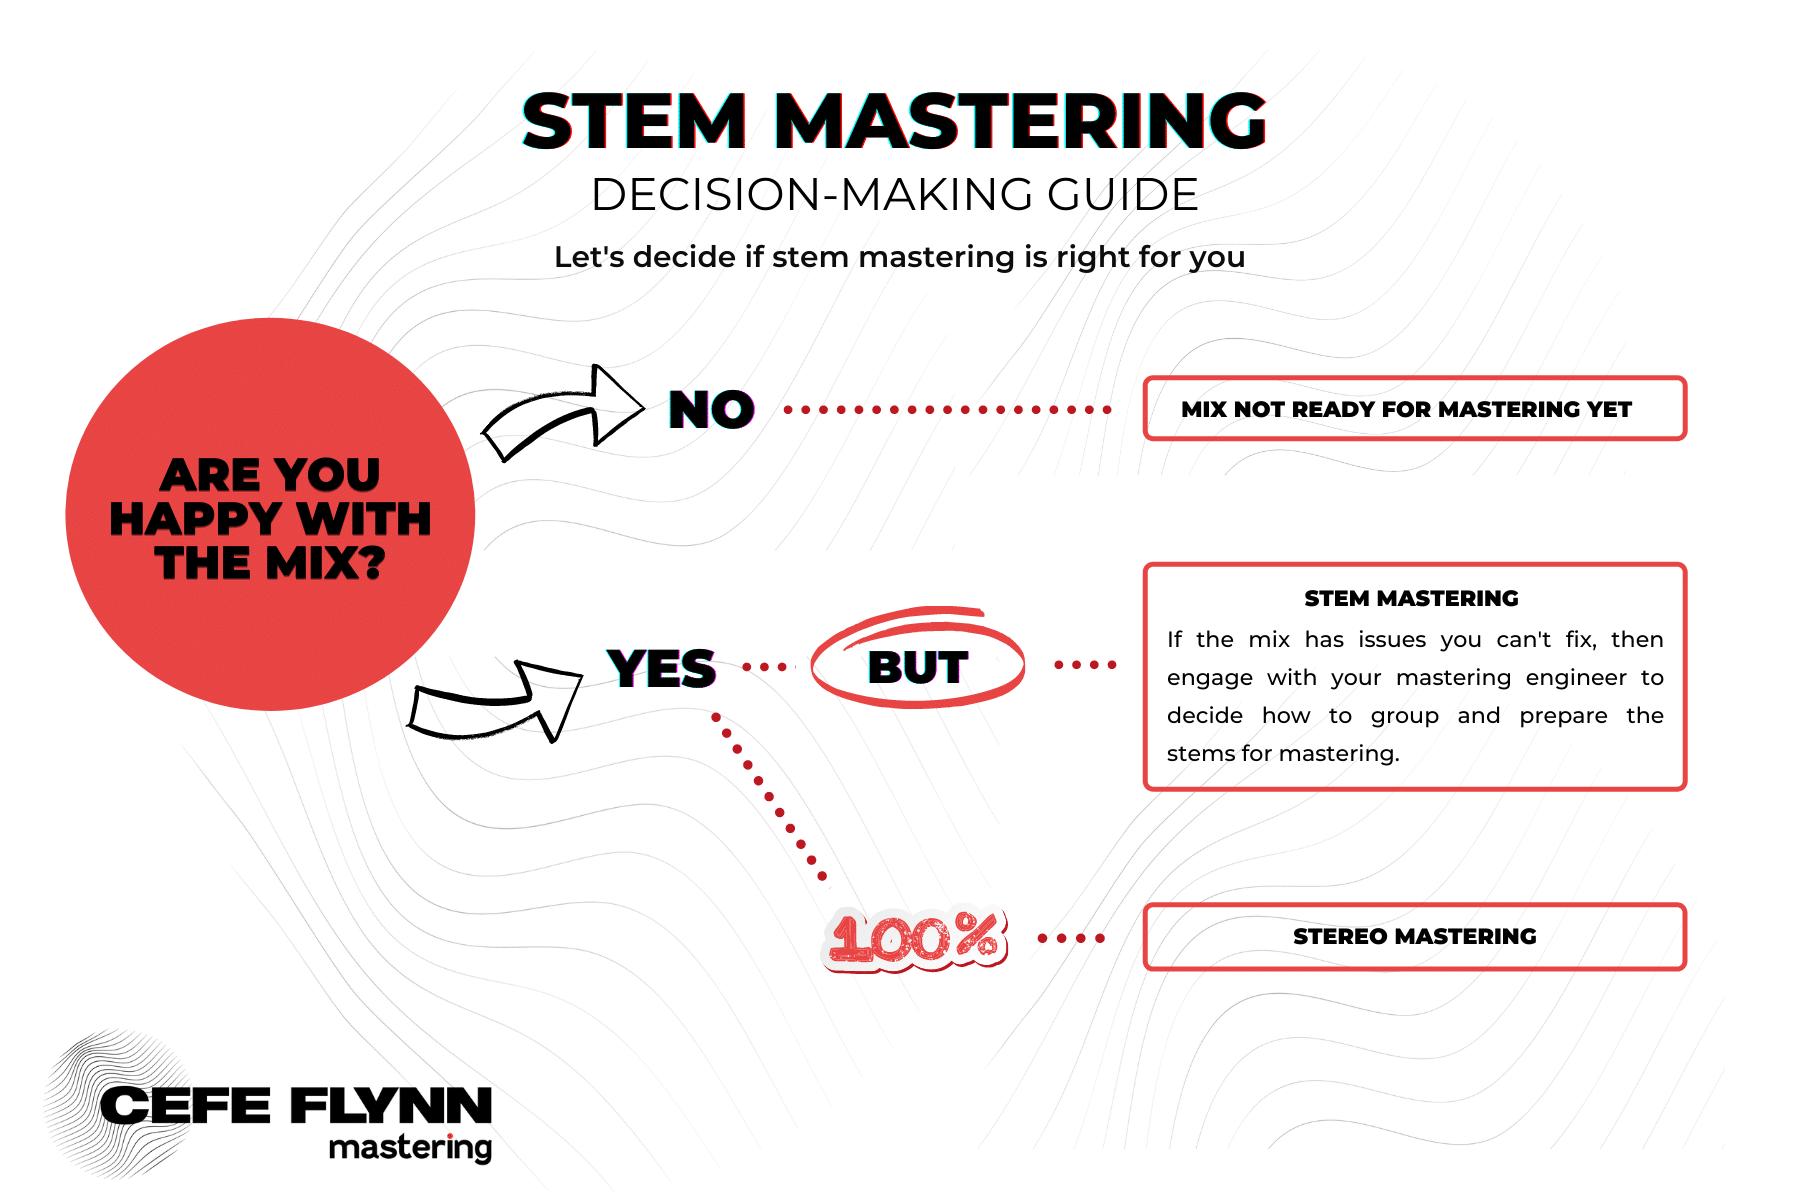 Stem Mastering- Decision-Making Guide